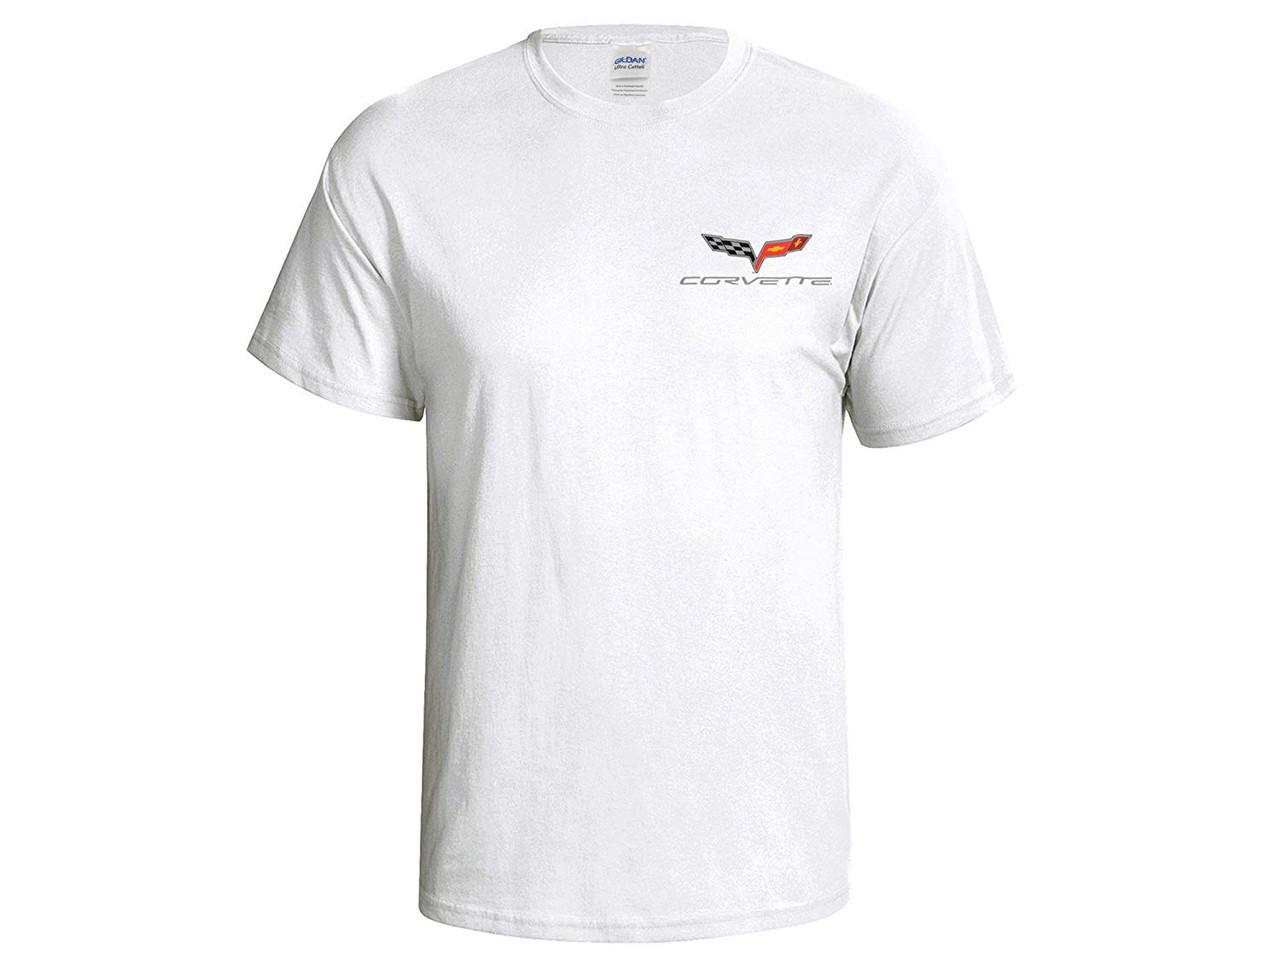 C6 Corvette White T-Shirt (front)